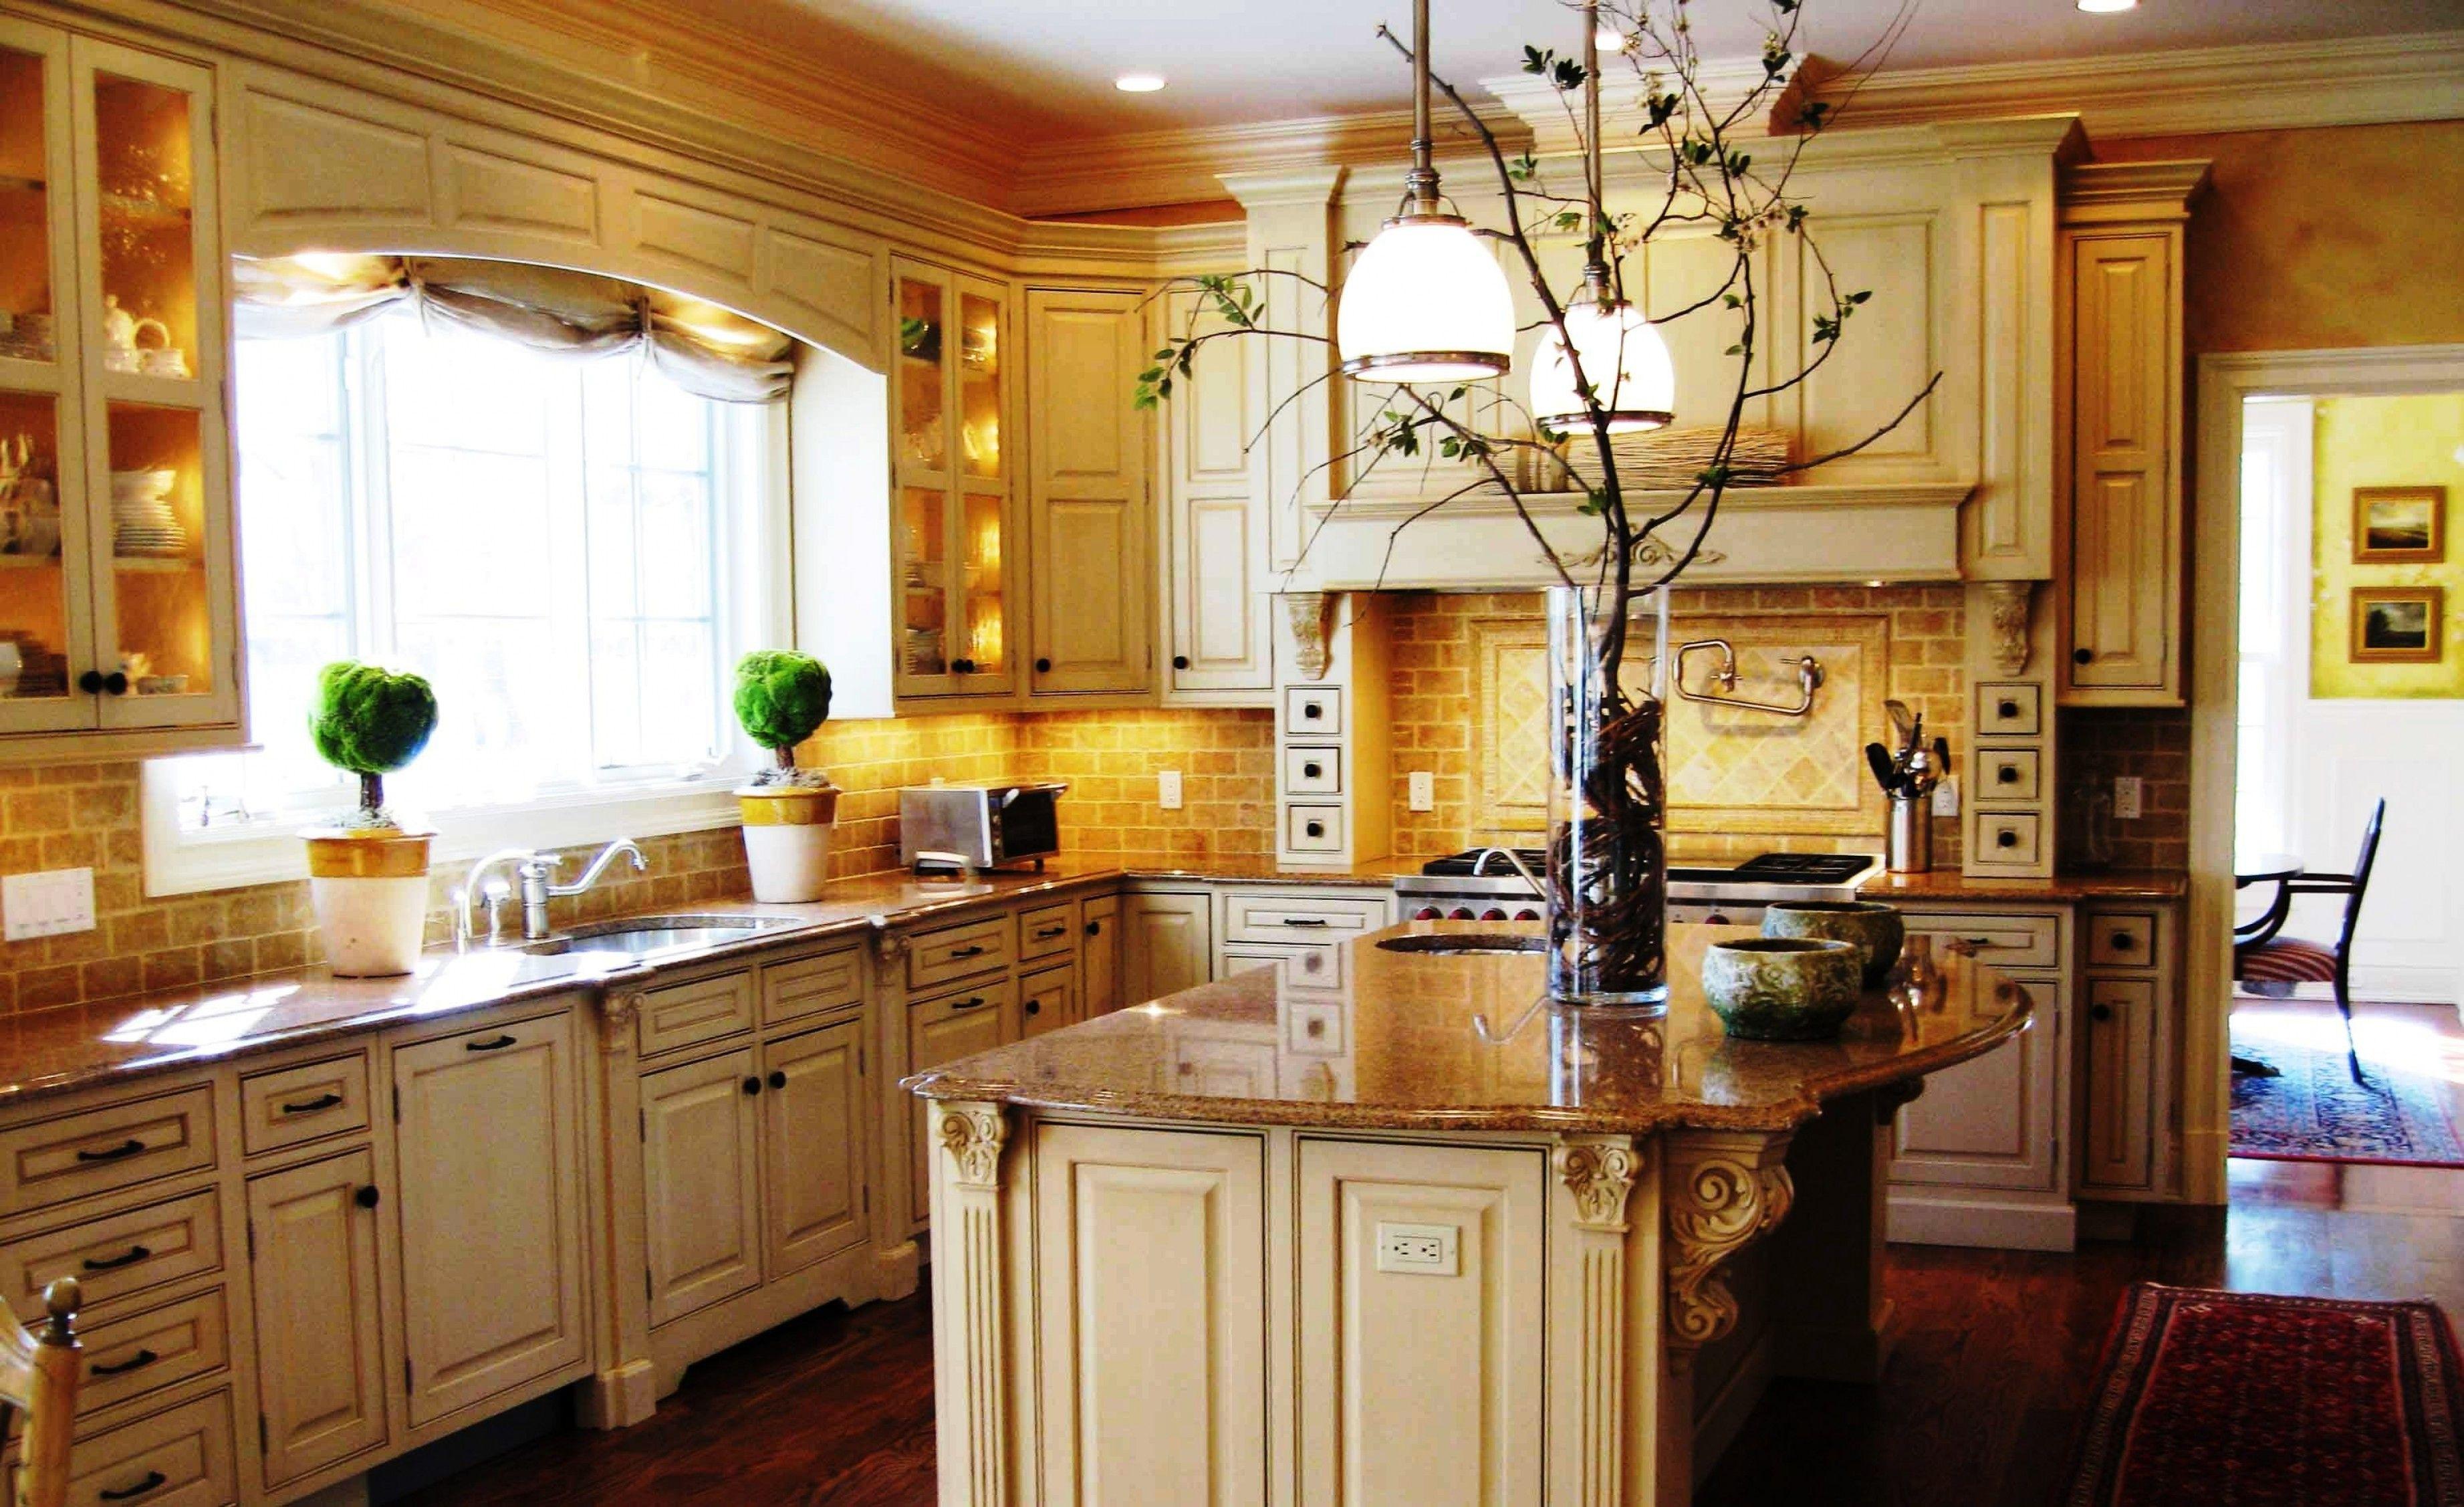 Tuscan Kitchen Interior Design Designs For Modern House Itsbodega ...